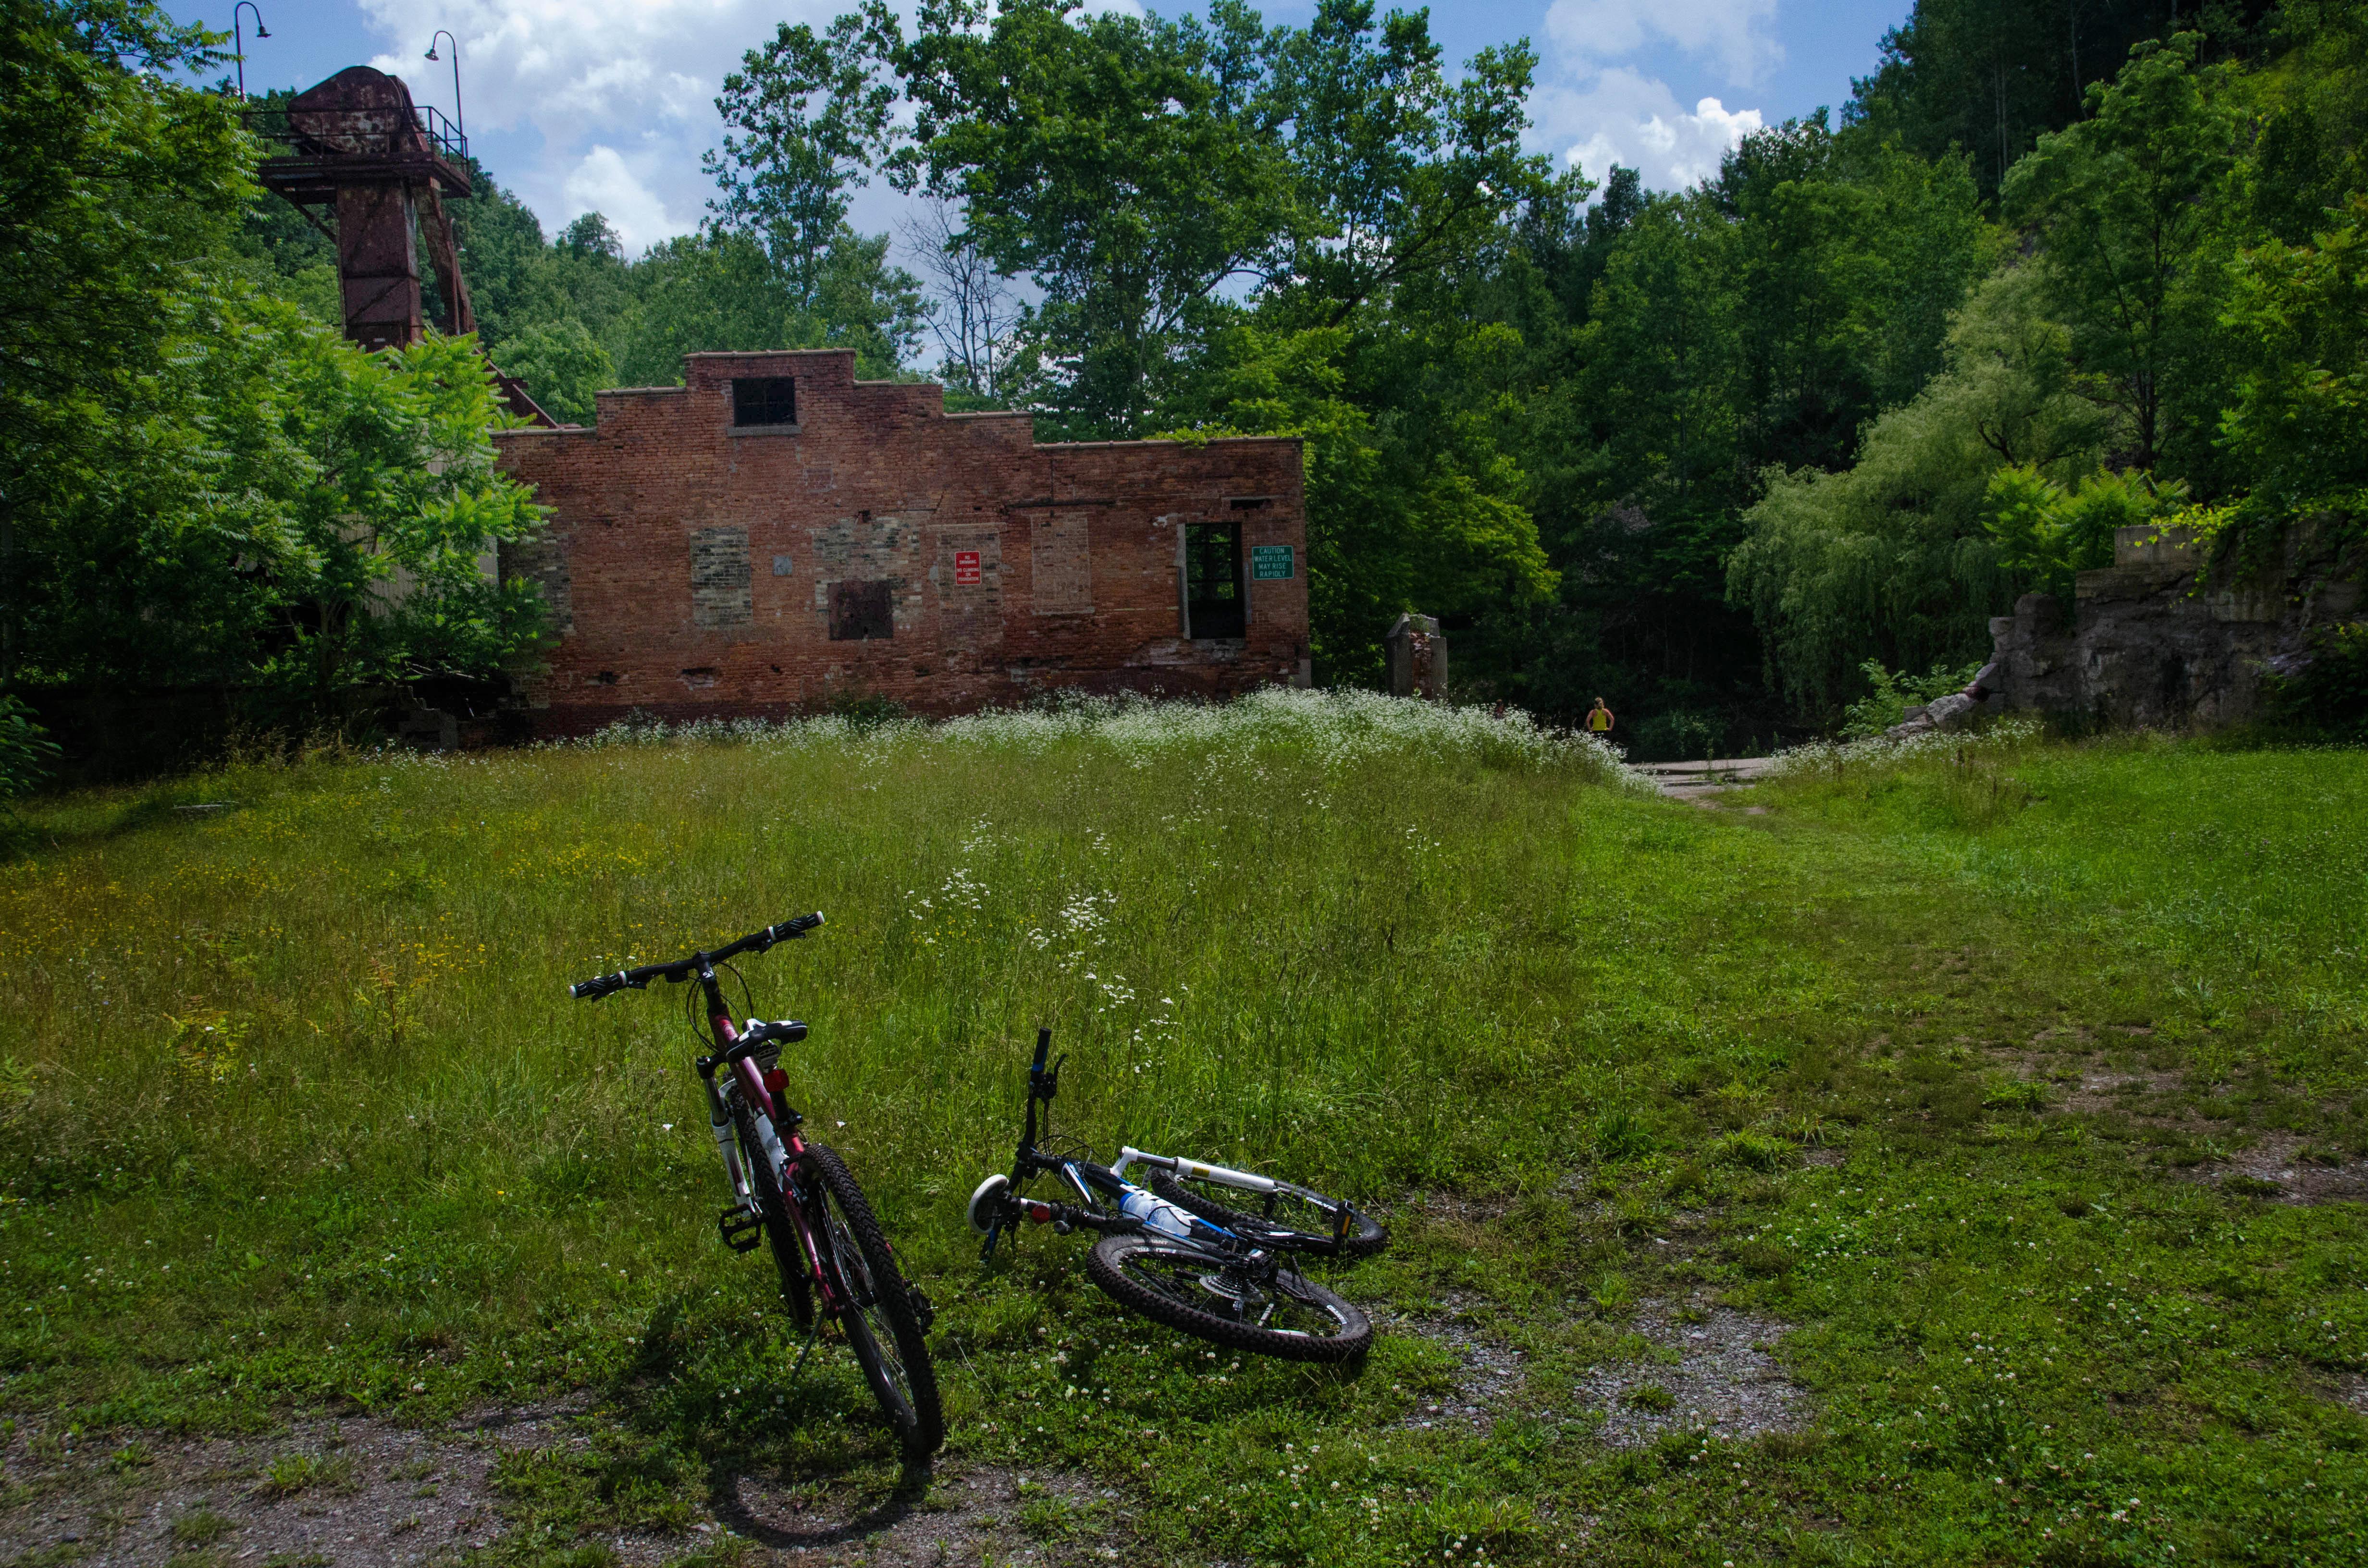 SK Bikes at Cascade